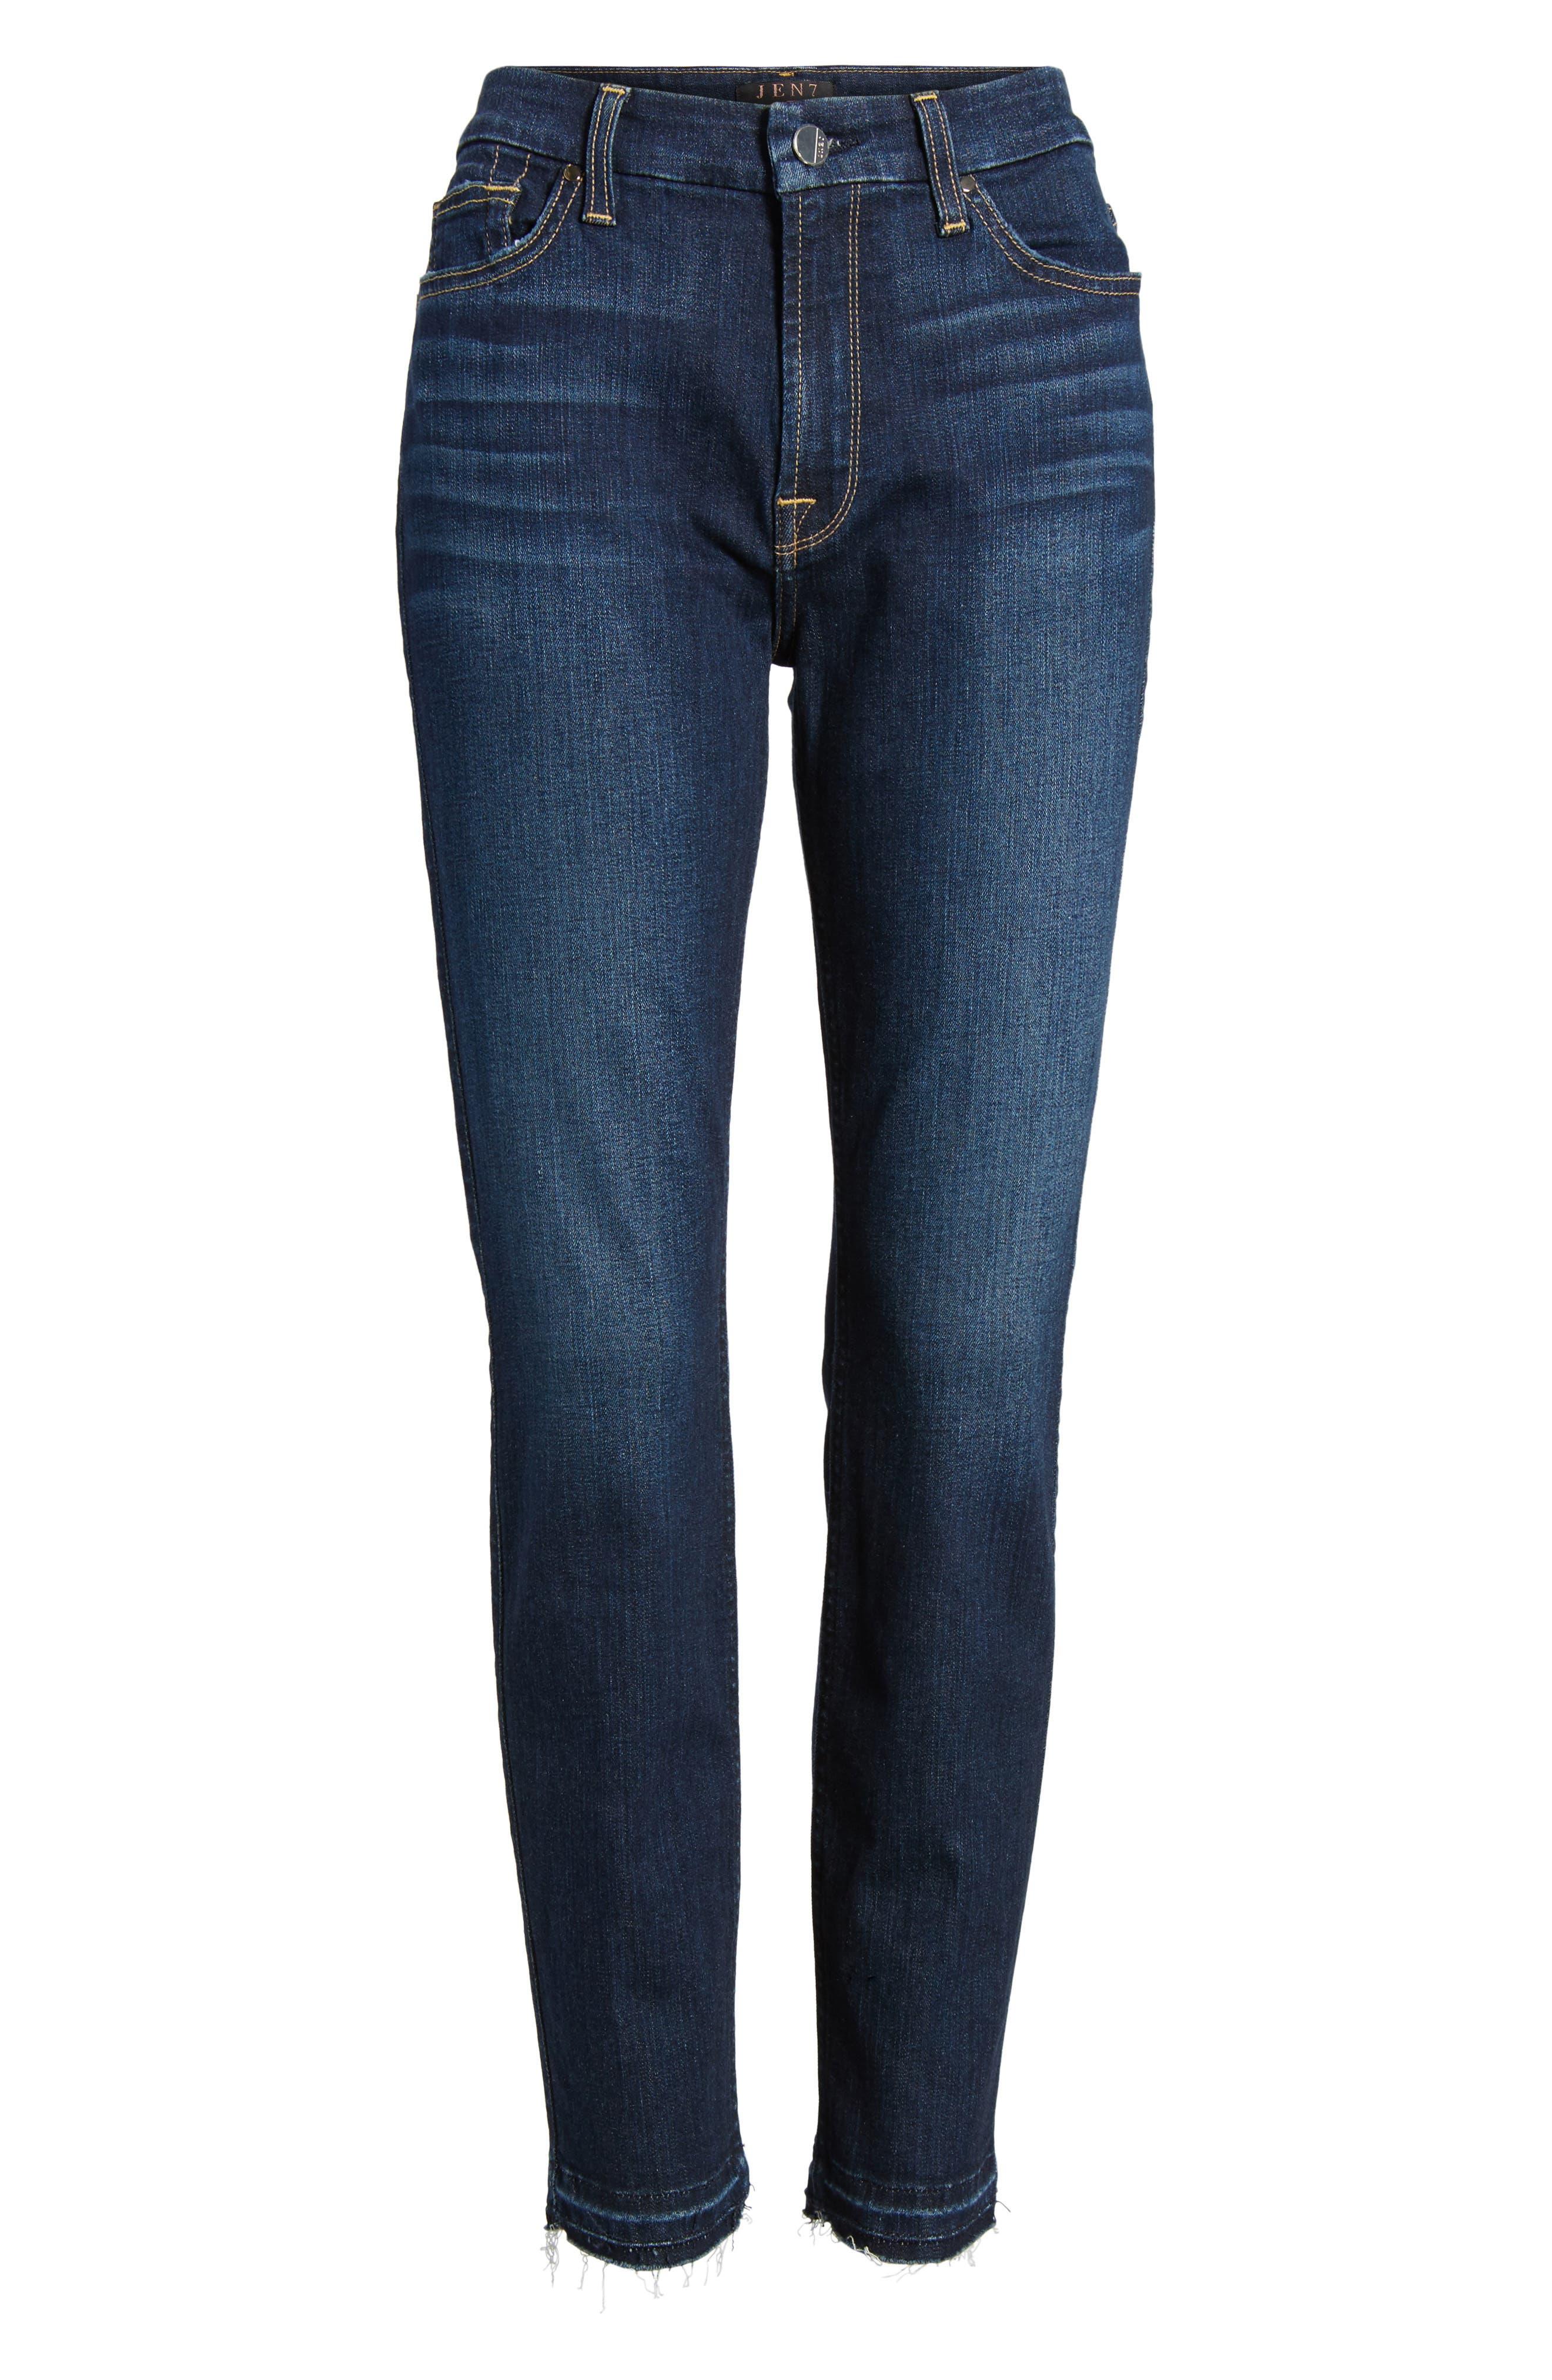 Release Hem Stretch Ankle Skinny Jeans,                             Alternate thumbnail 6, color,                             Prague Deep Blue